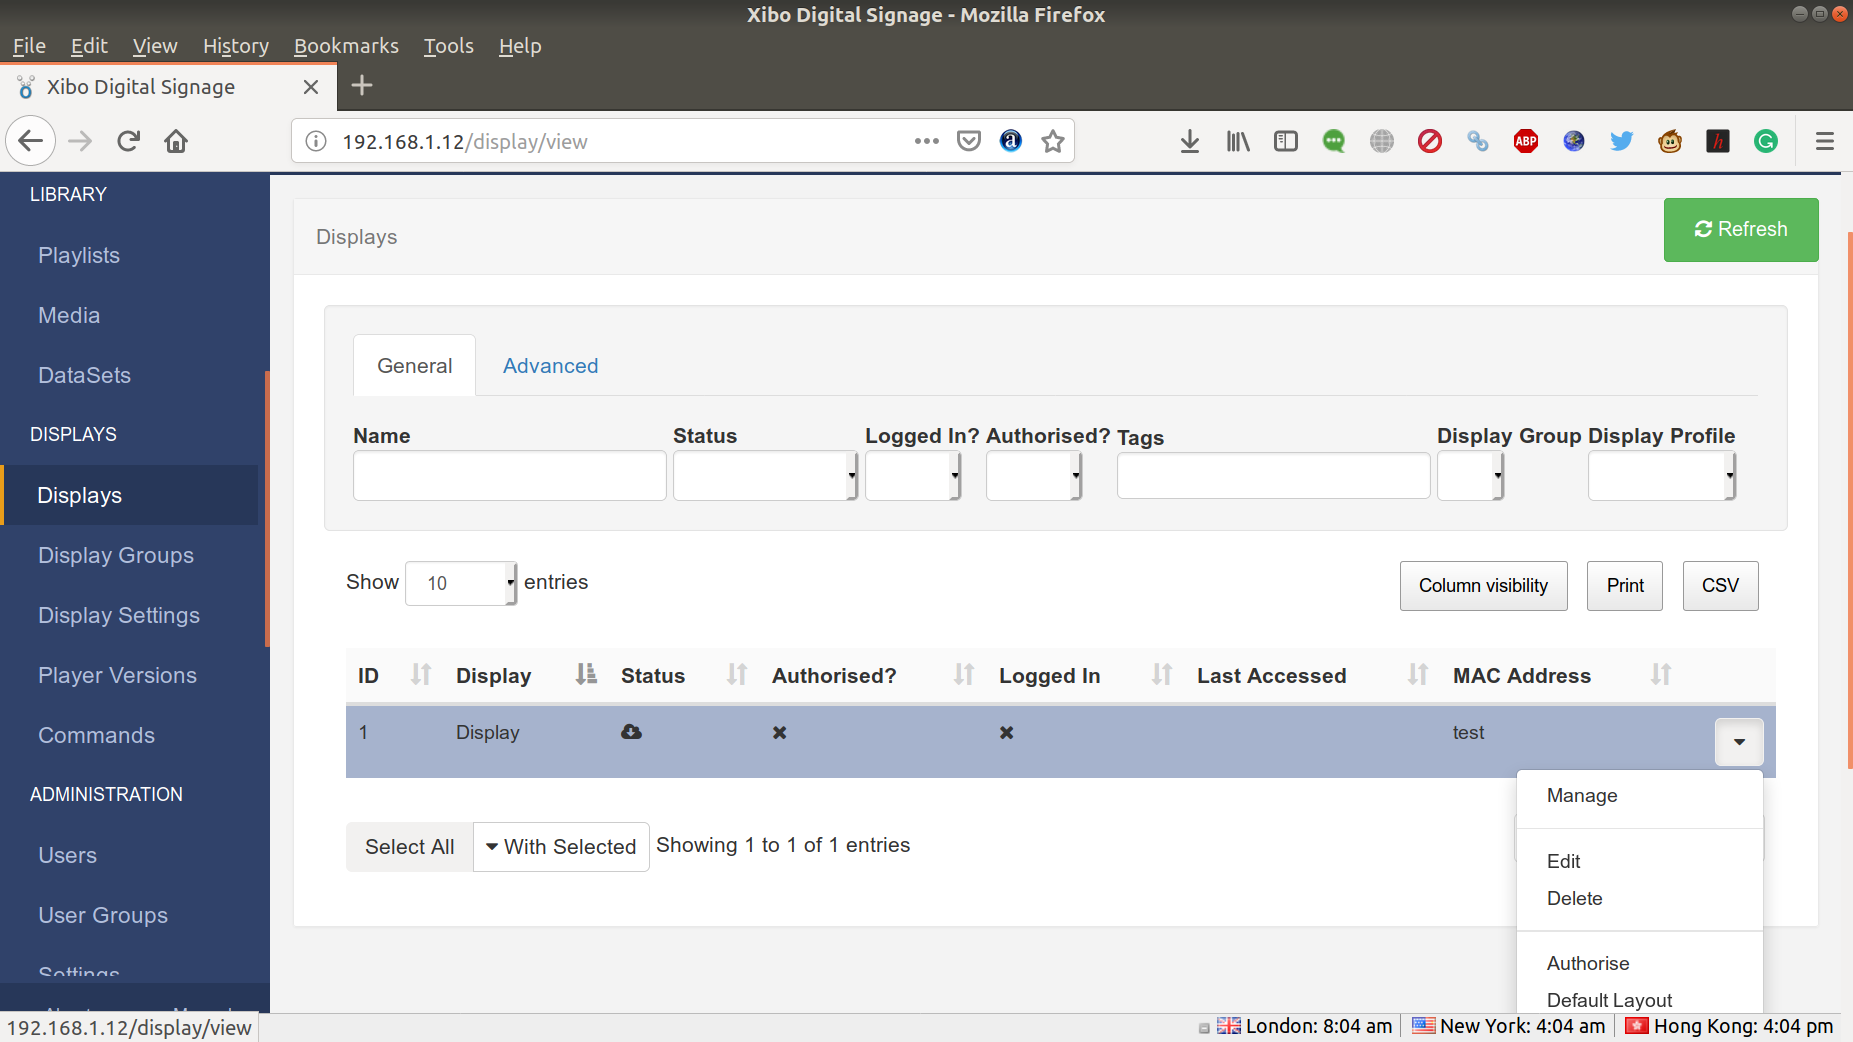 MINIX NEO Z83-4U Review - Ubuntu 18 04, Kodi 18, and Xibo